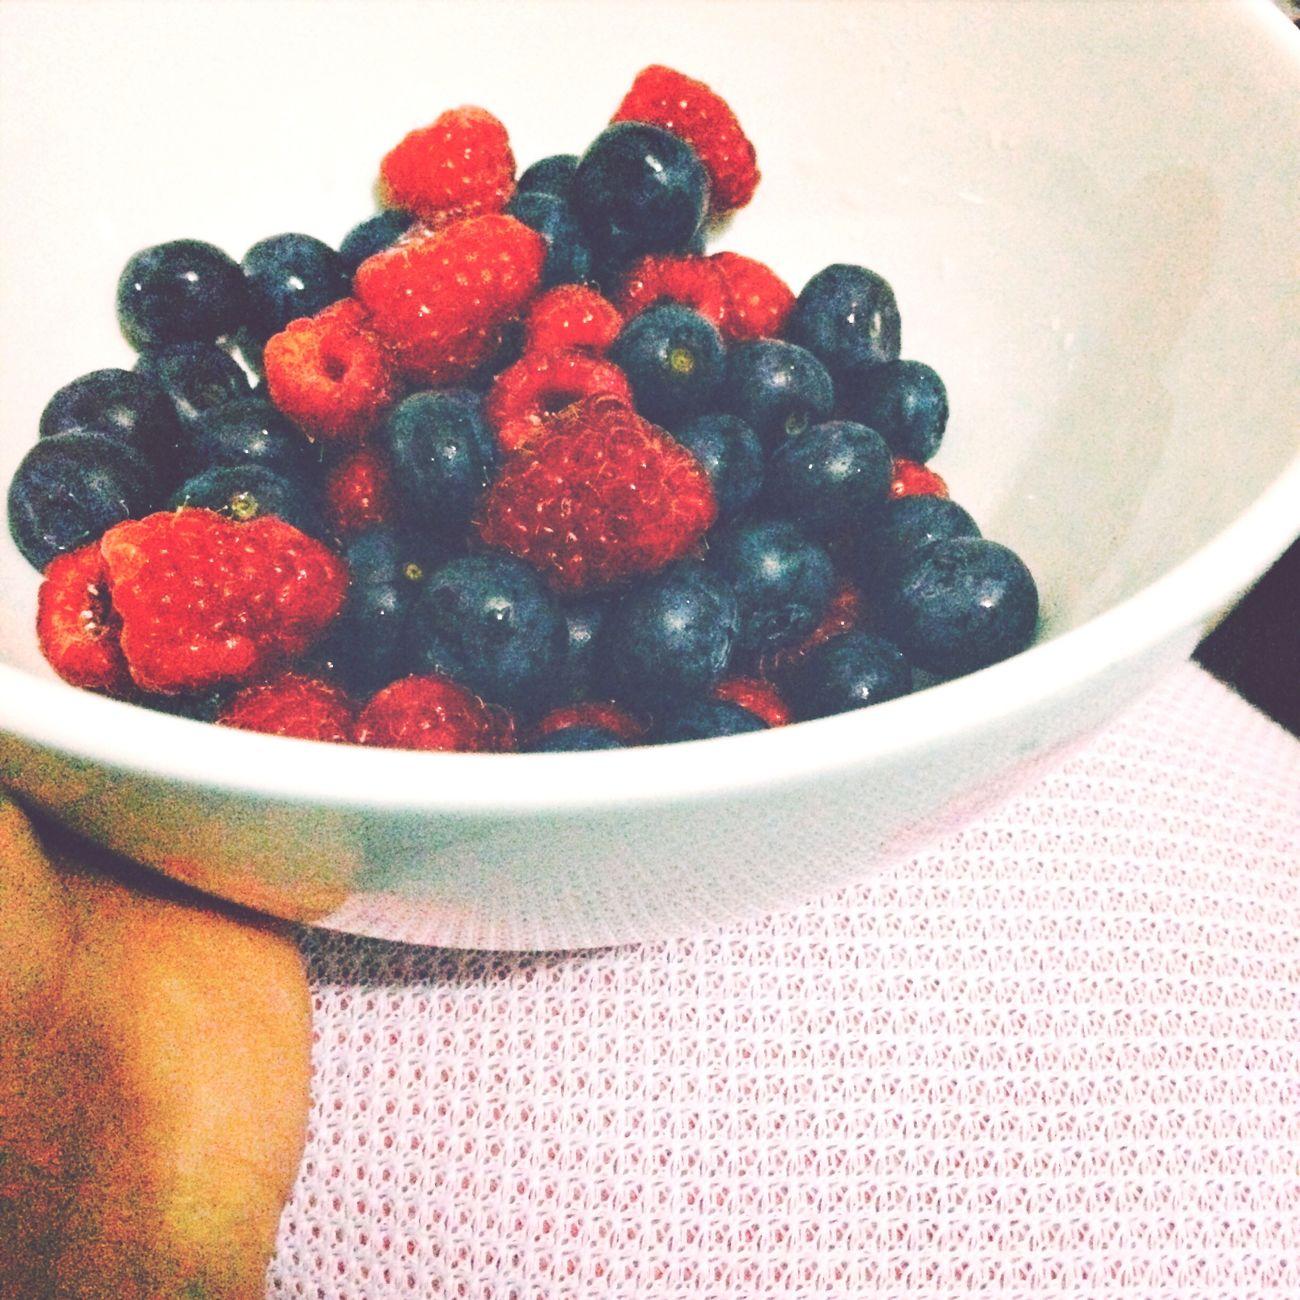 Blueberries Lamponi  Fruits Berries